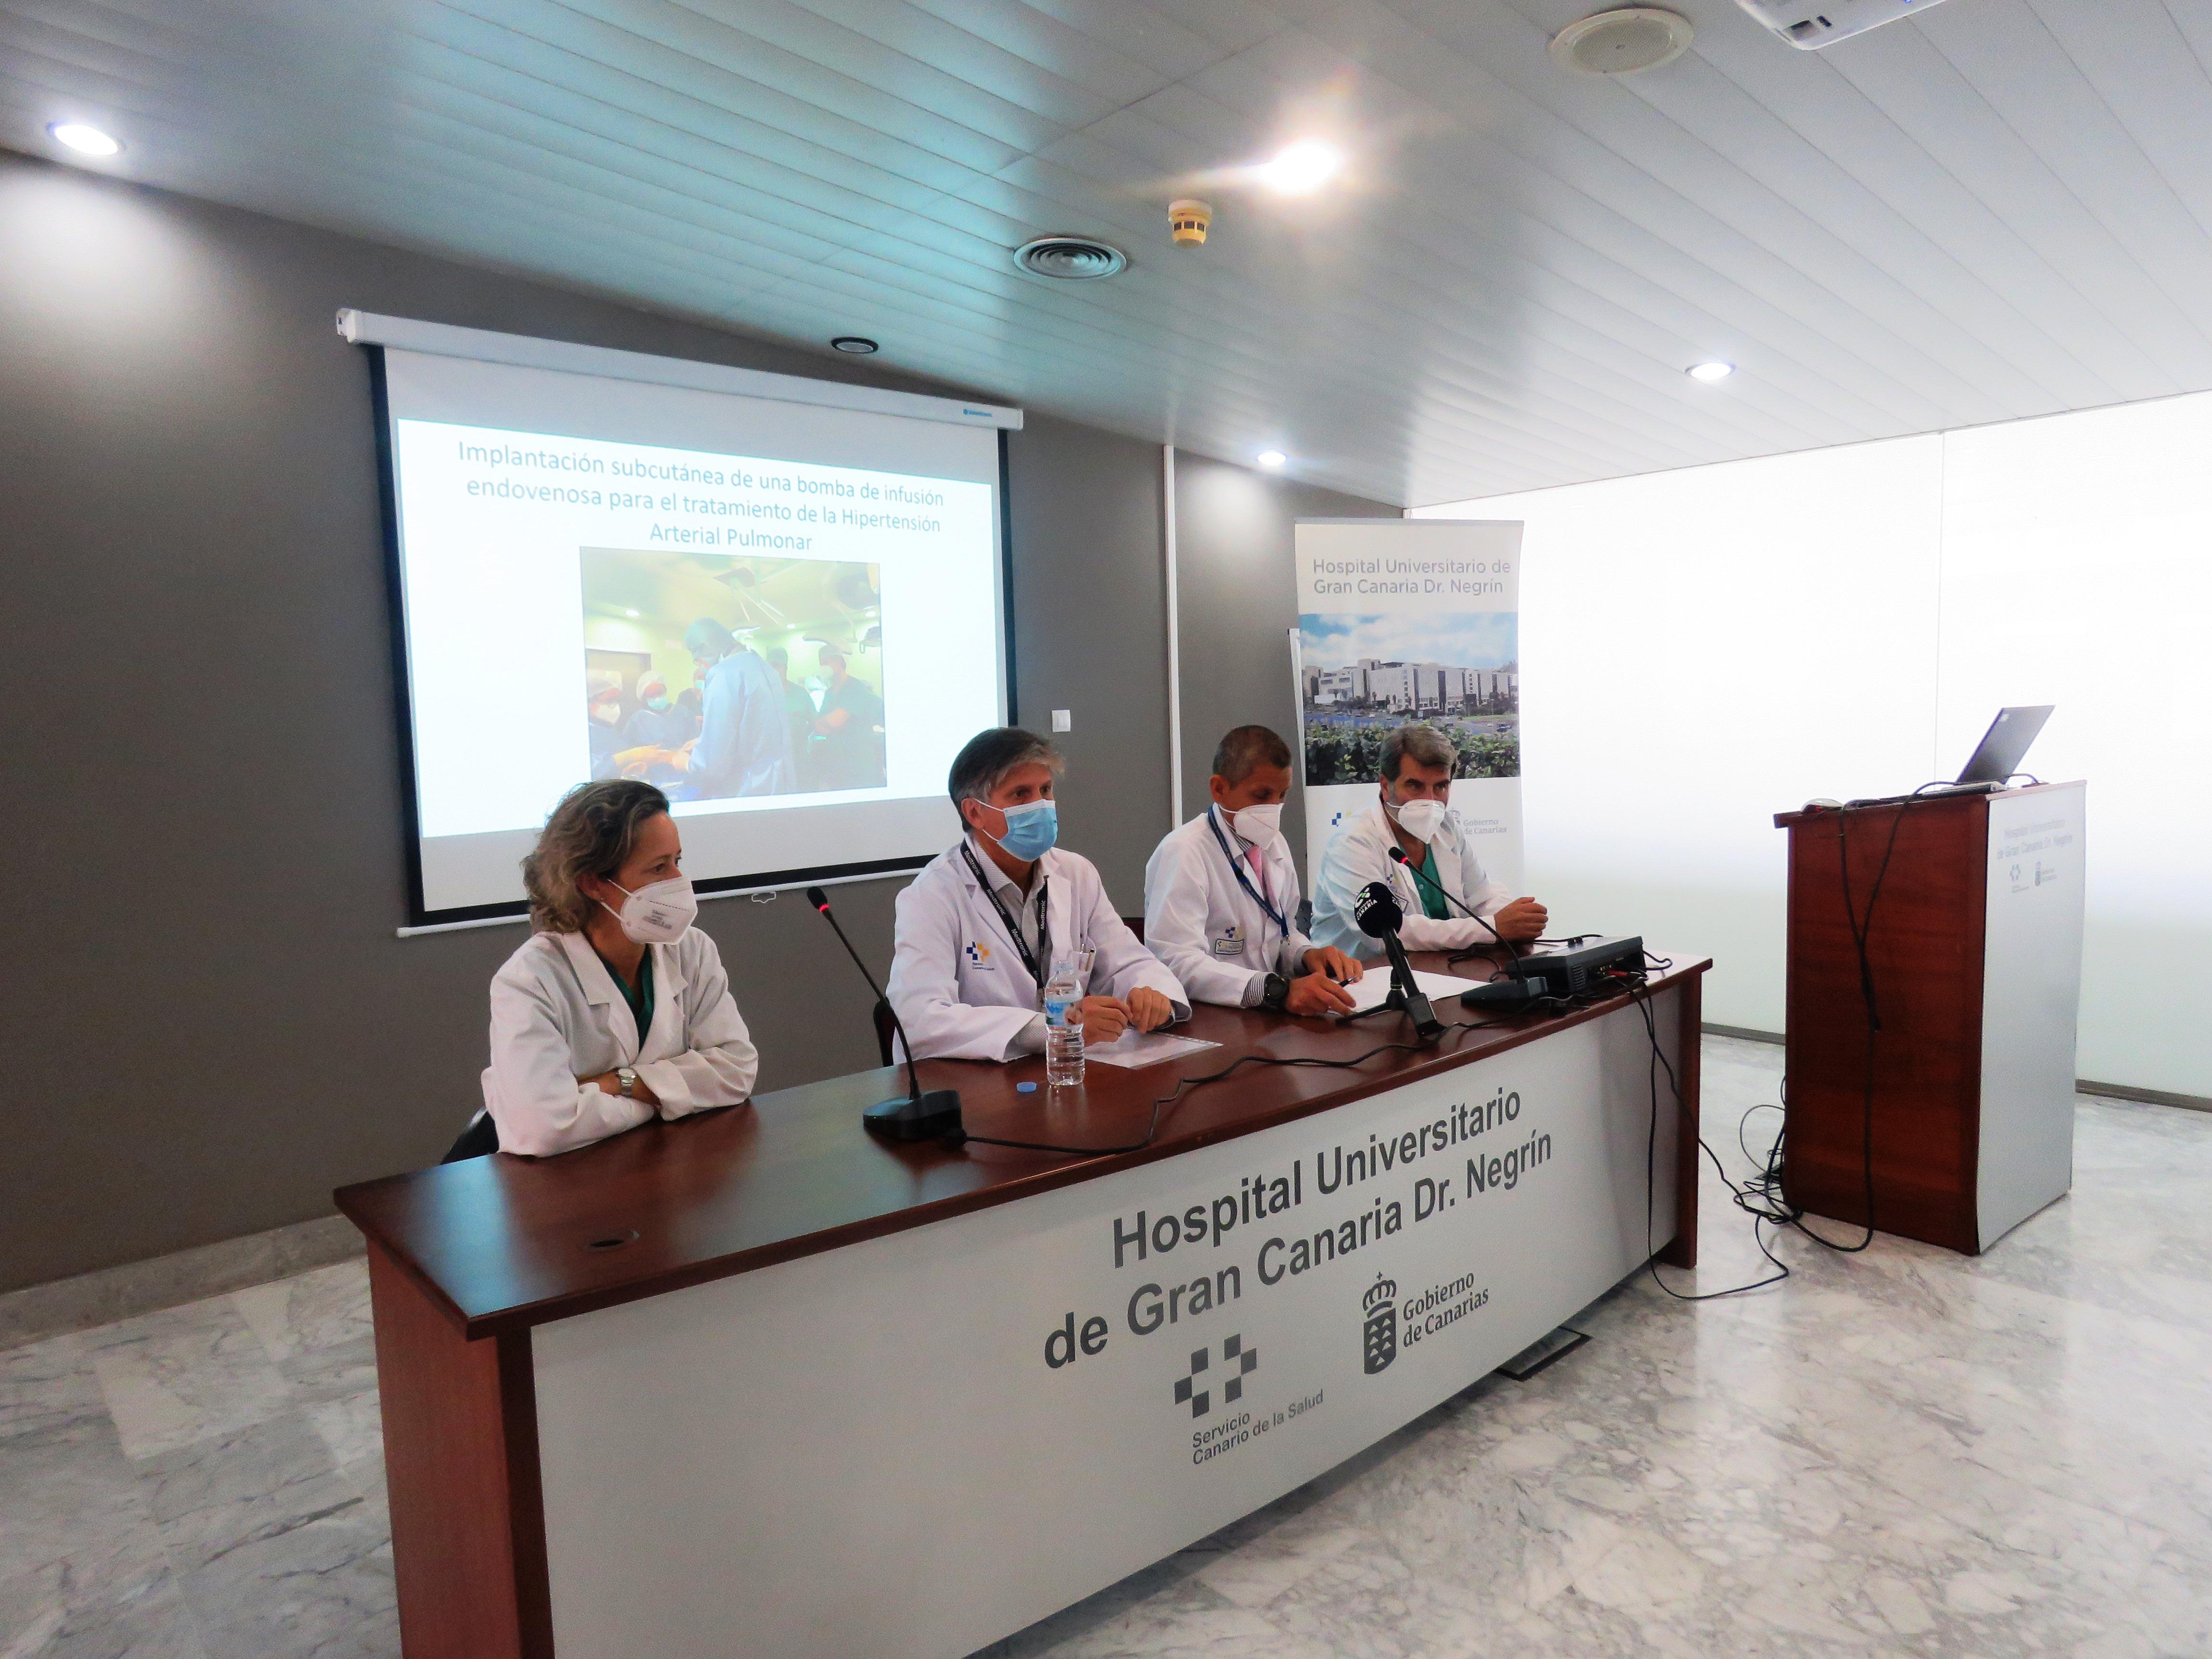 Momento de la rueda de prensa celebrada en el Hospital Dr. Negrín